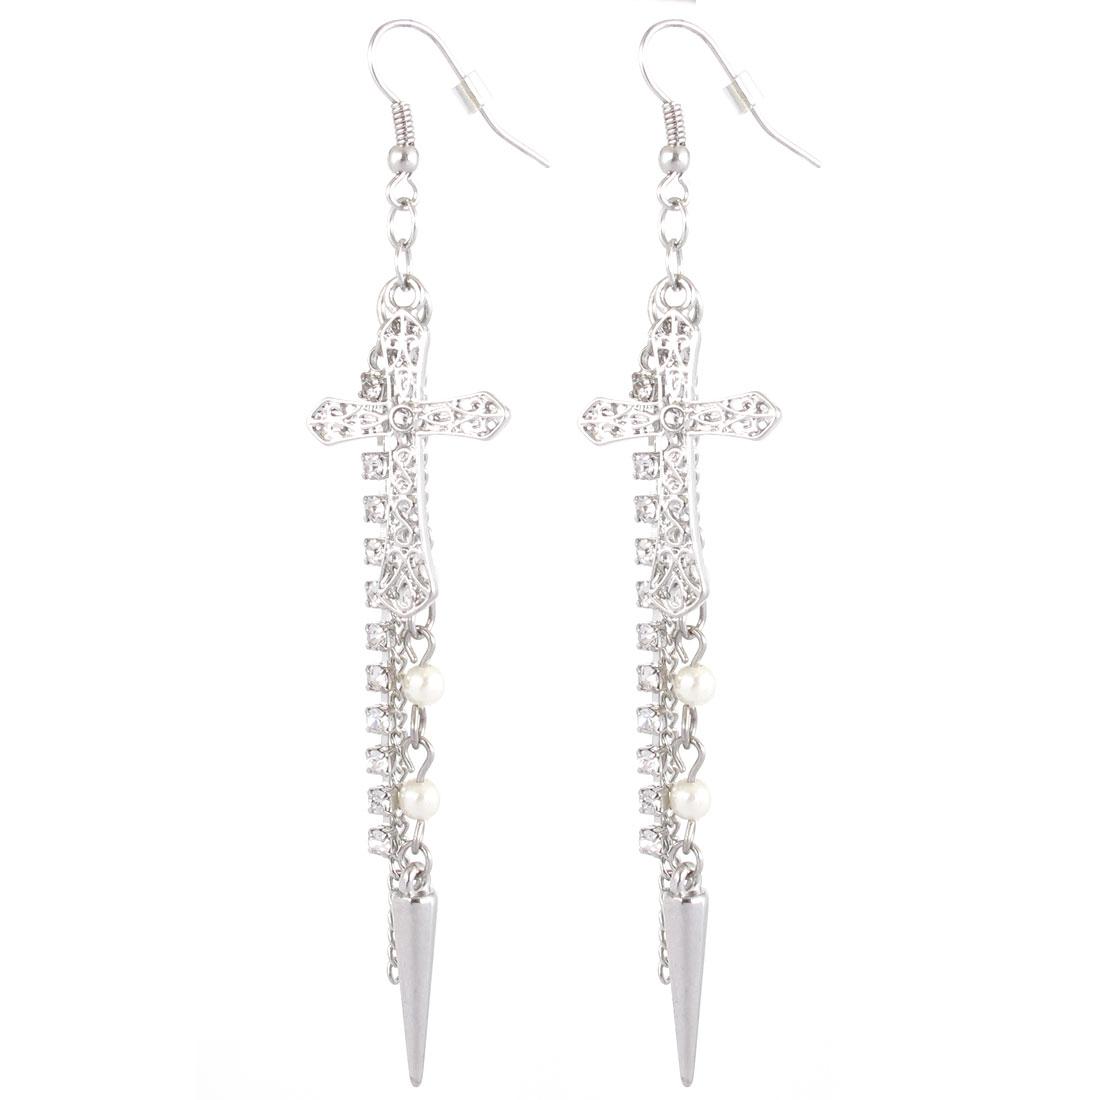 "Women Plastic Diamante White Beads Decor Chain Tassels Crux Design Hanging Pendant Metal Fish Hook Earrings Earbob Silver Tone 3.9"" Length Pair"